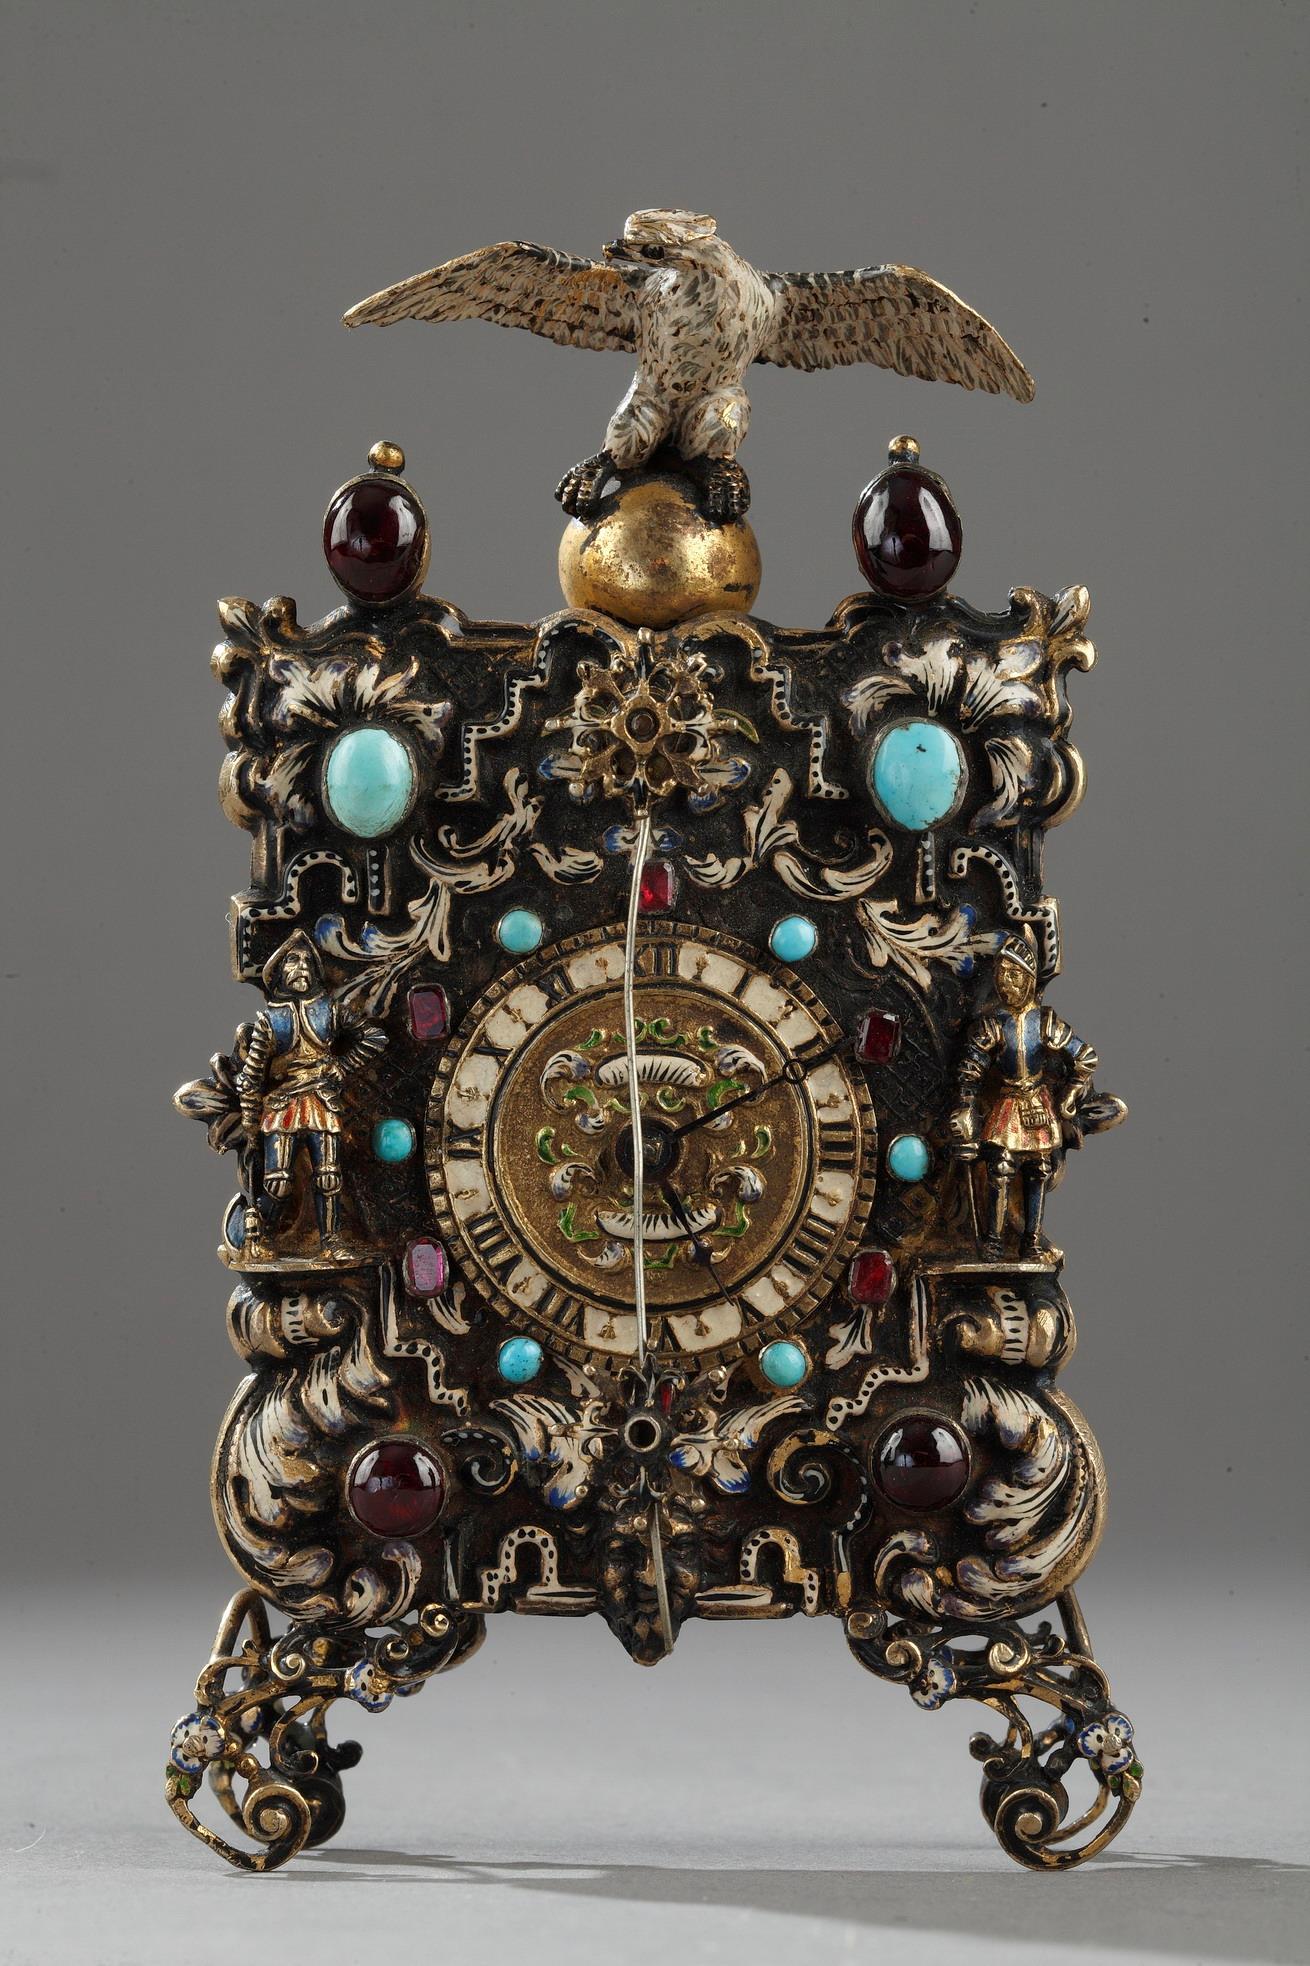 19th century Viennese clock.